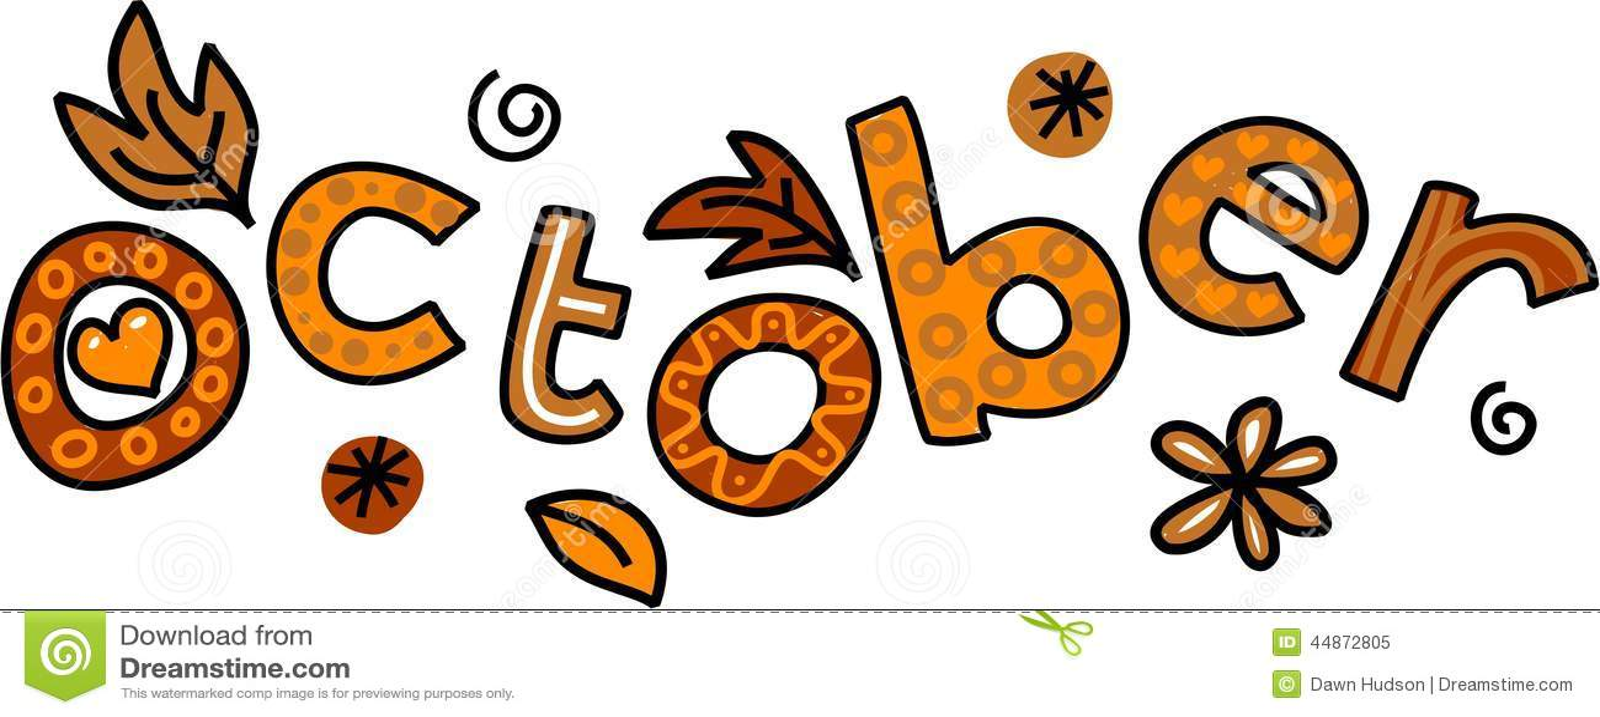 oktober clipart stock abbildung bild 44872805 october clip art images october clip art for free